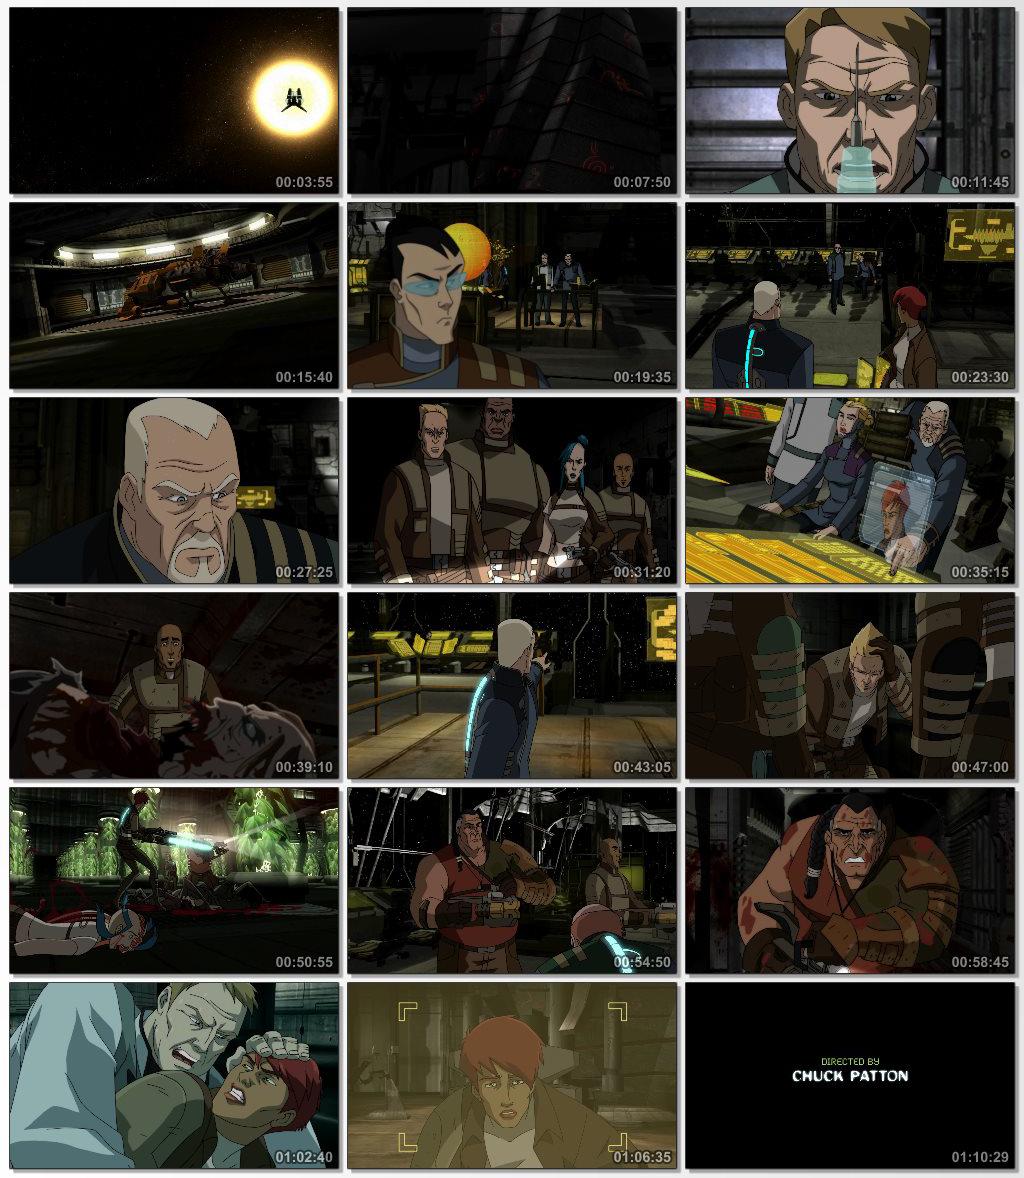 Dead.Space.Downfall.2008.720p.BluRay.www.download.ir.mkv_thumbs_[2014.11.24_11.25.07]